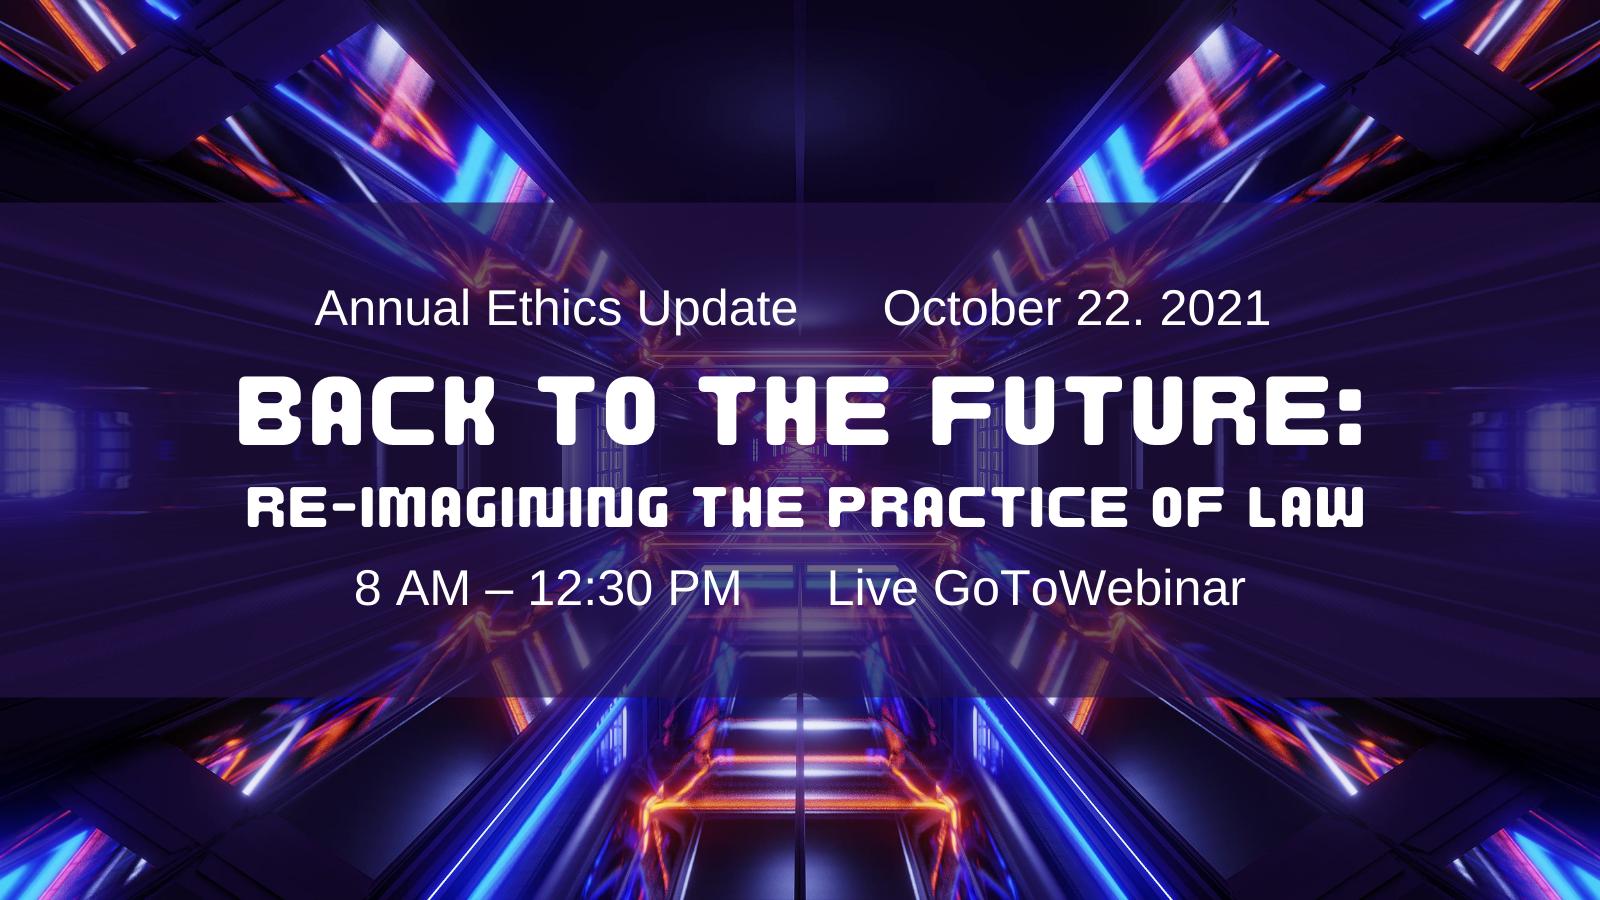 2021 Annual Ethics Update